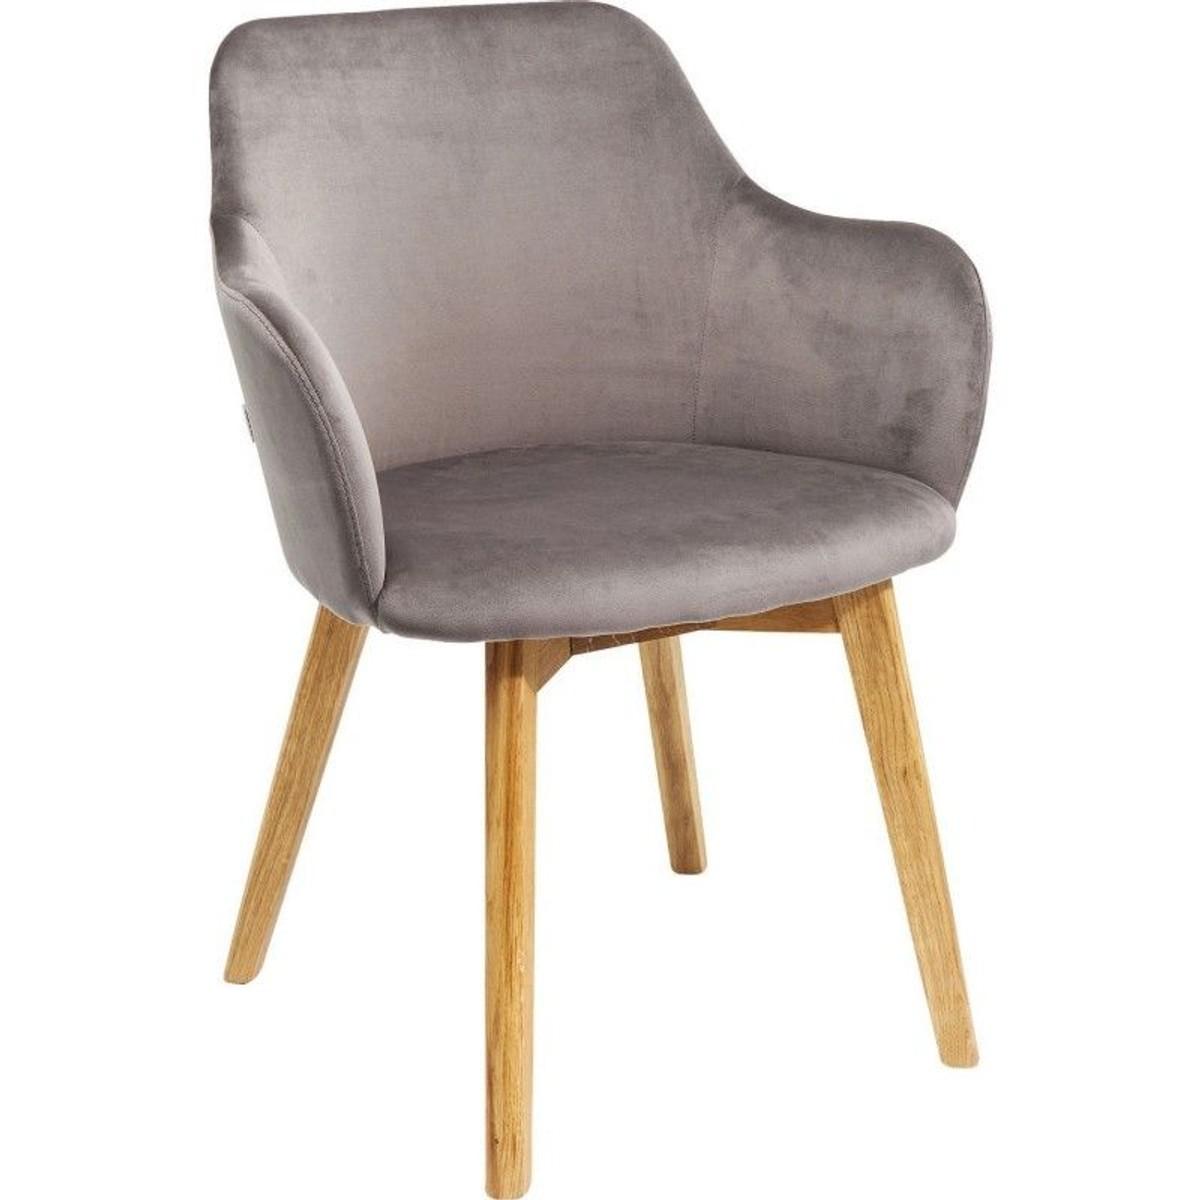 Chaise Avec Accoudoirs Lady Velours Gris Kare Design Taille Tu Chaise Accoudoir Kare Design Et Chaise